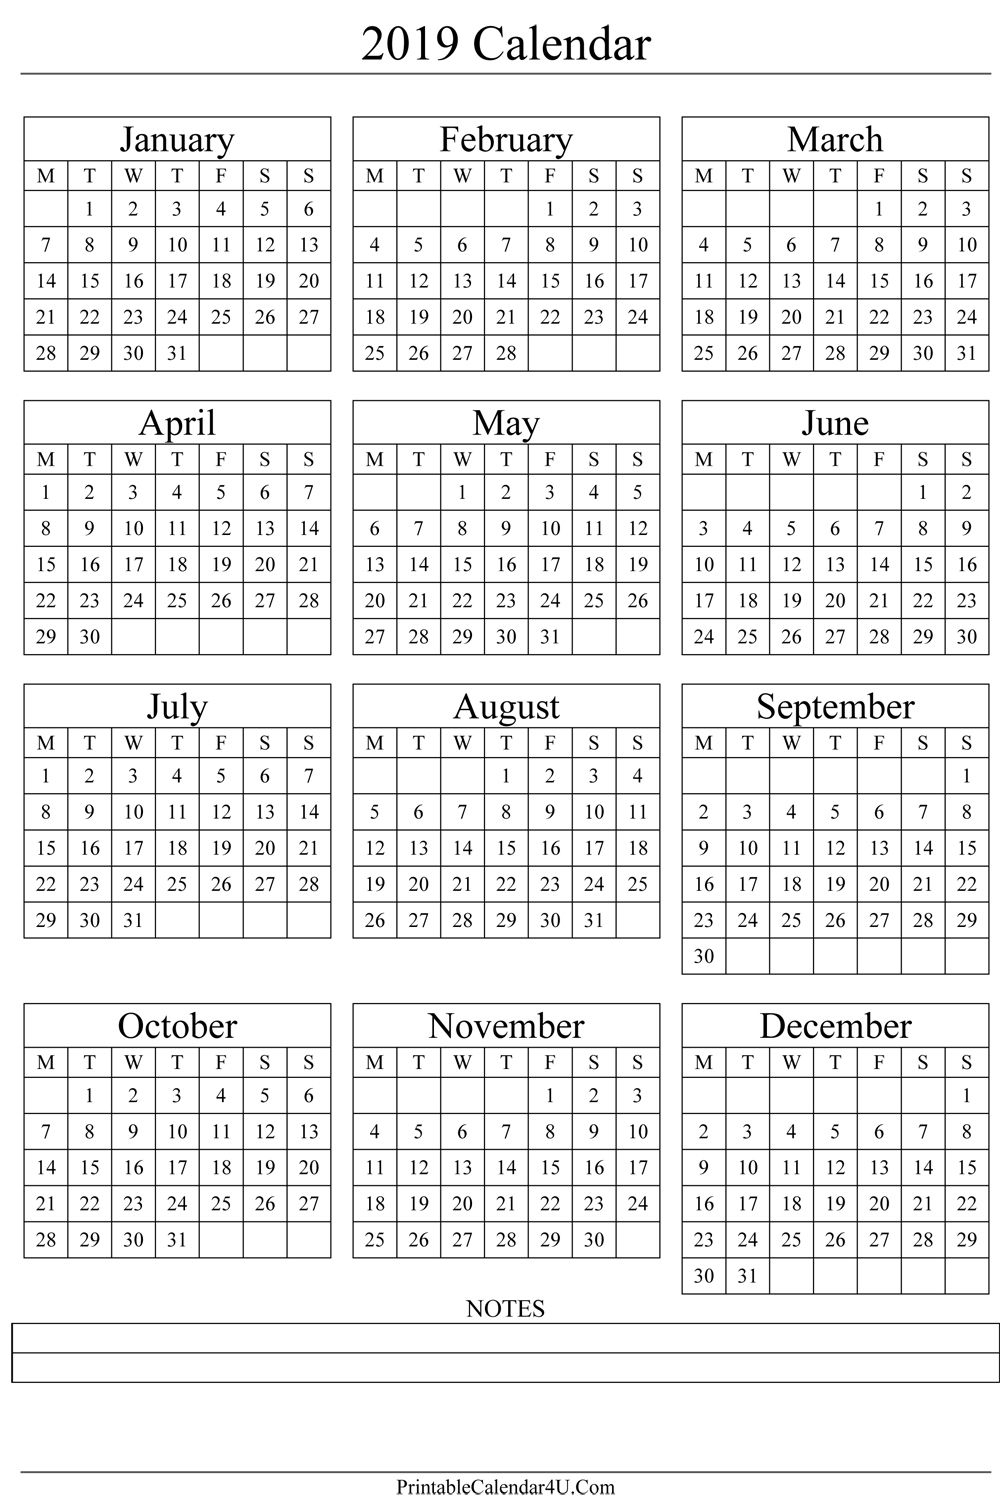 Annual Calendar 2019 Portrait Printable Calendar 2017 | Gift Ideas within 1 Page Year Long Calendar Printable Free